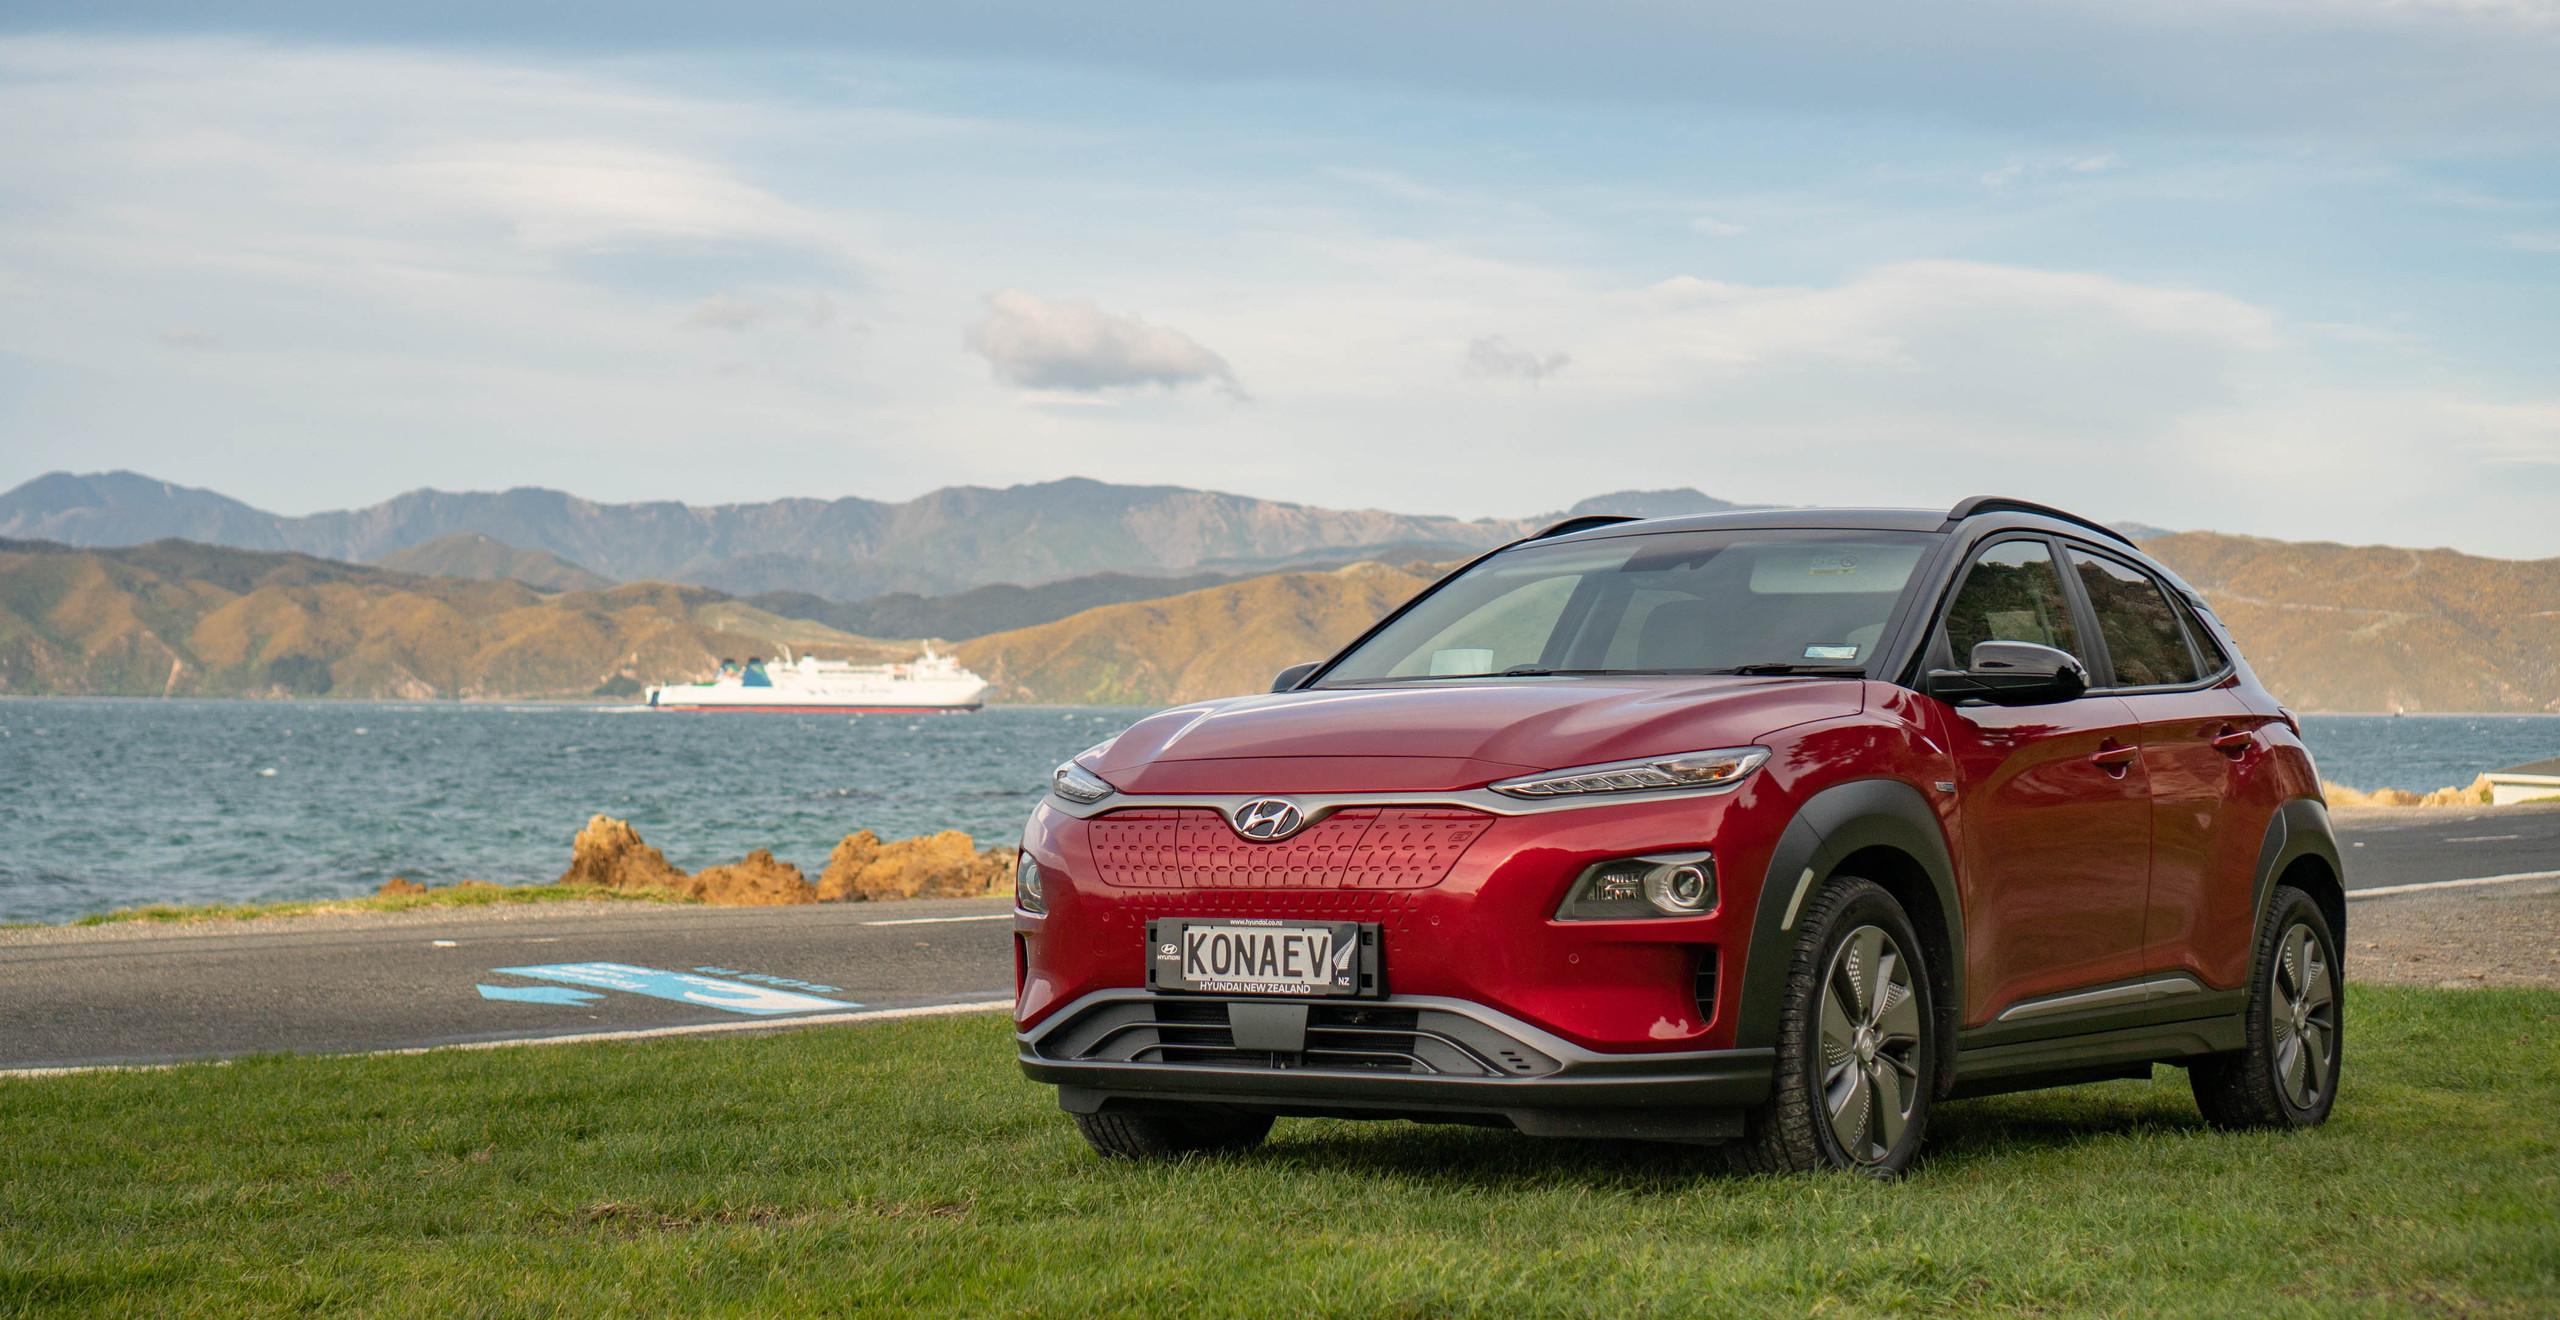 Hyundai Kona Electric 2019 front exterior red Wellington New Zealand Interislander